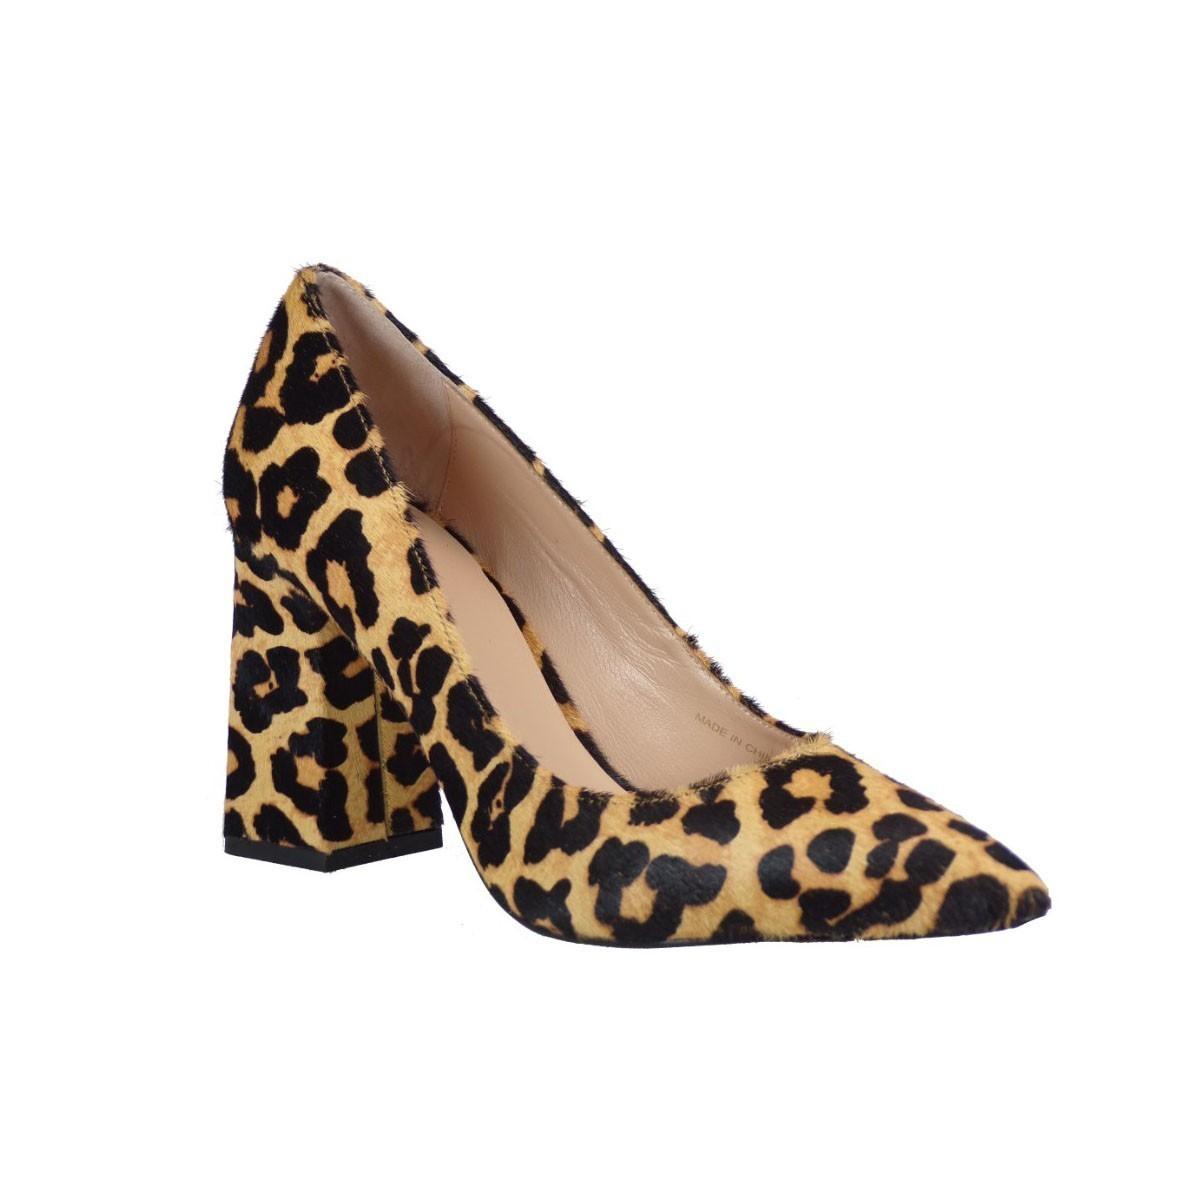 LIU JO DECOLLETE Γυναικεία Παπούτσια S67091 Μαύρο Δέρμα